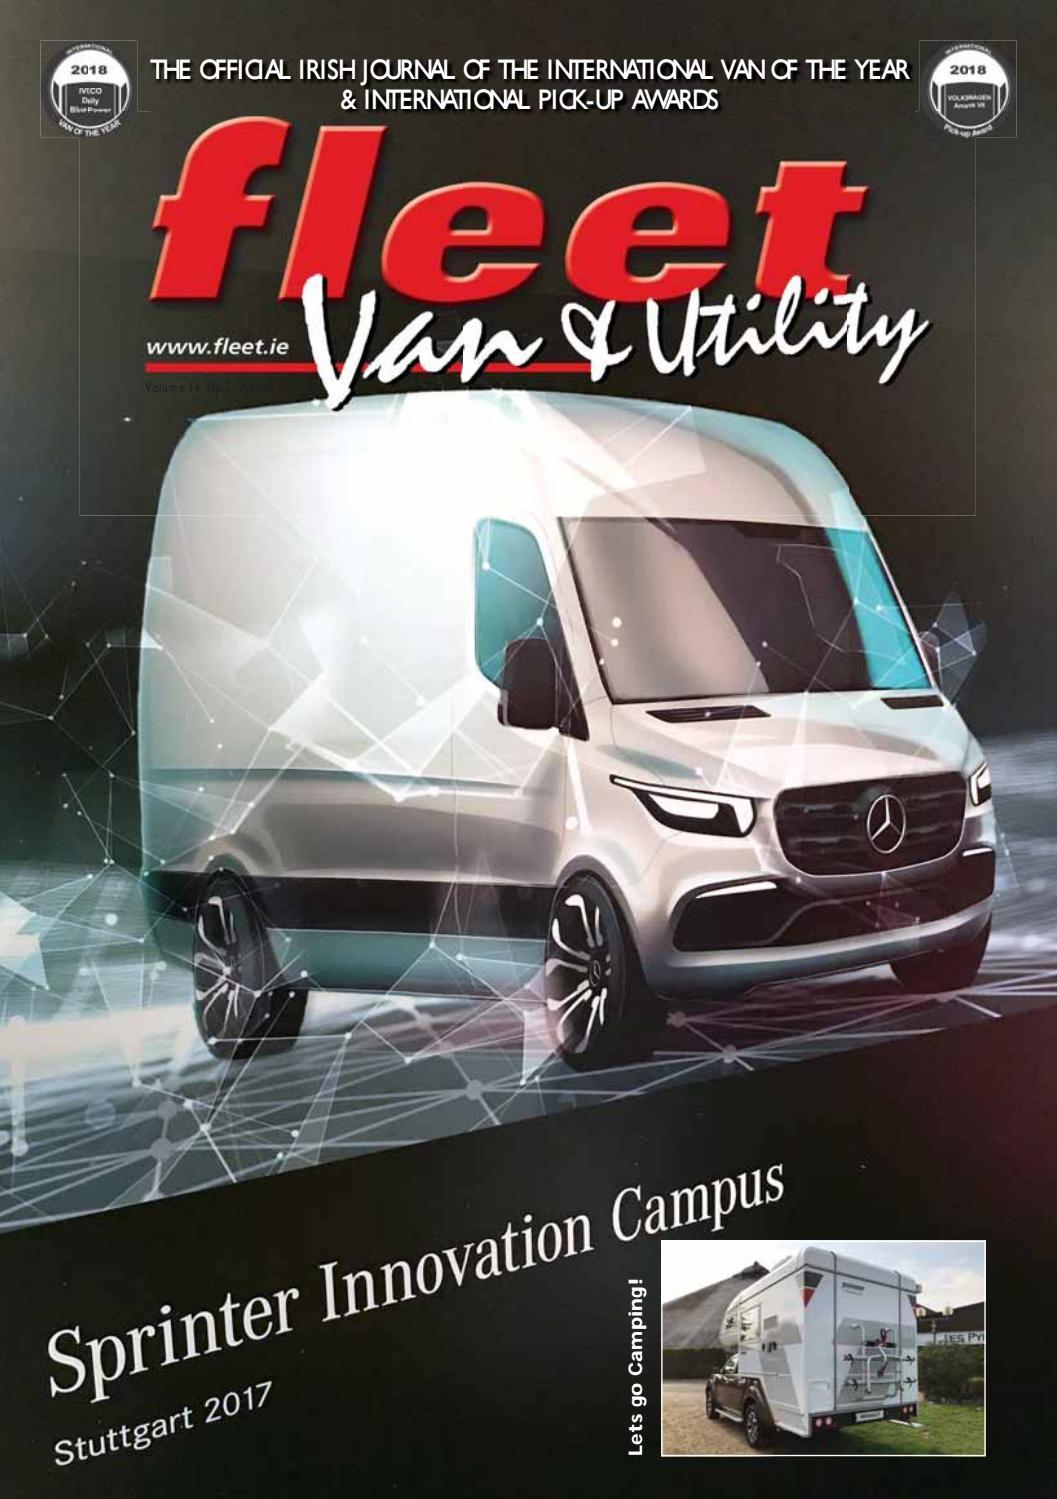 ccfb0b1c21 Fleet van   utility spring18 webfull by Fleet Transport - issuu